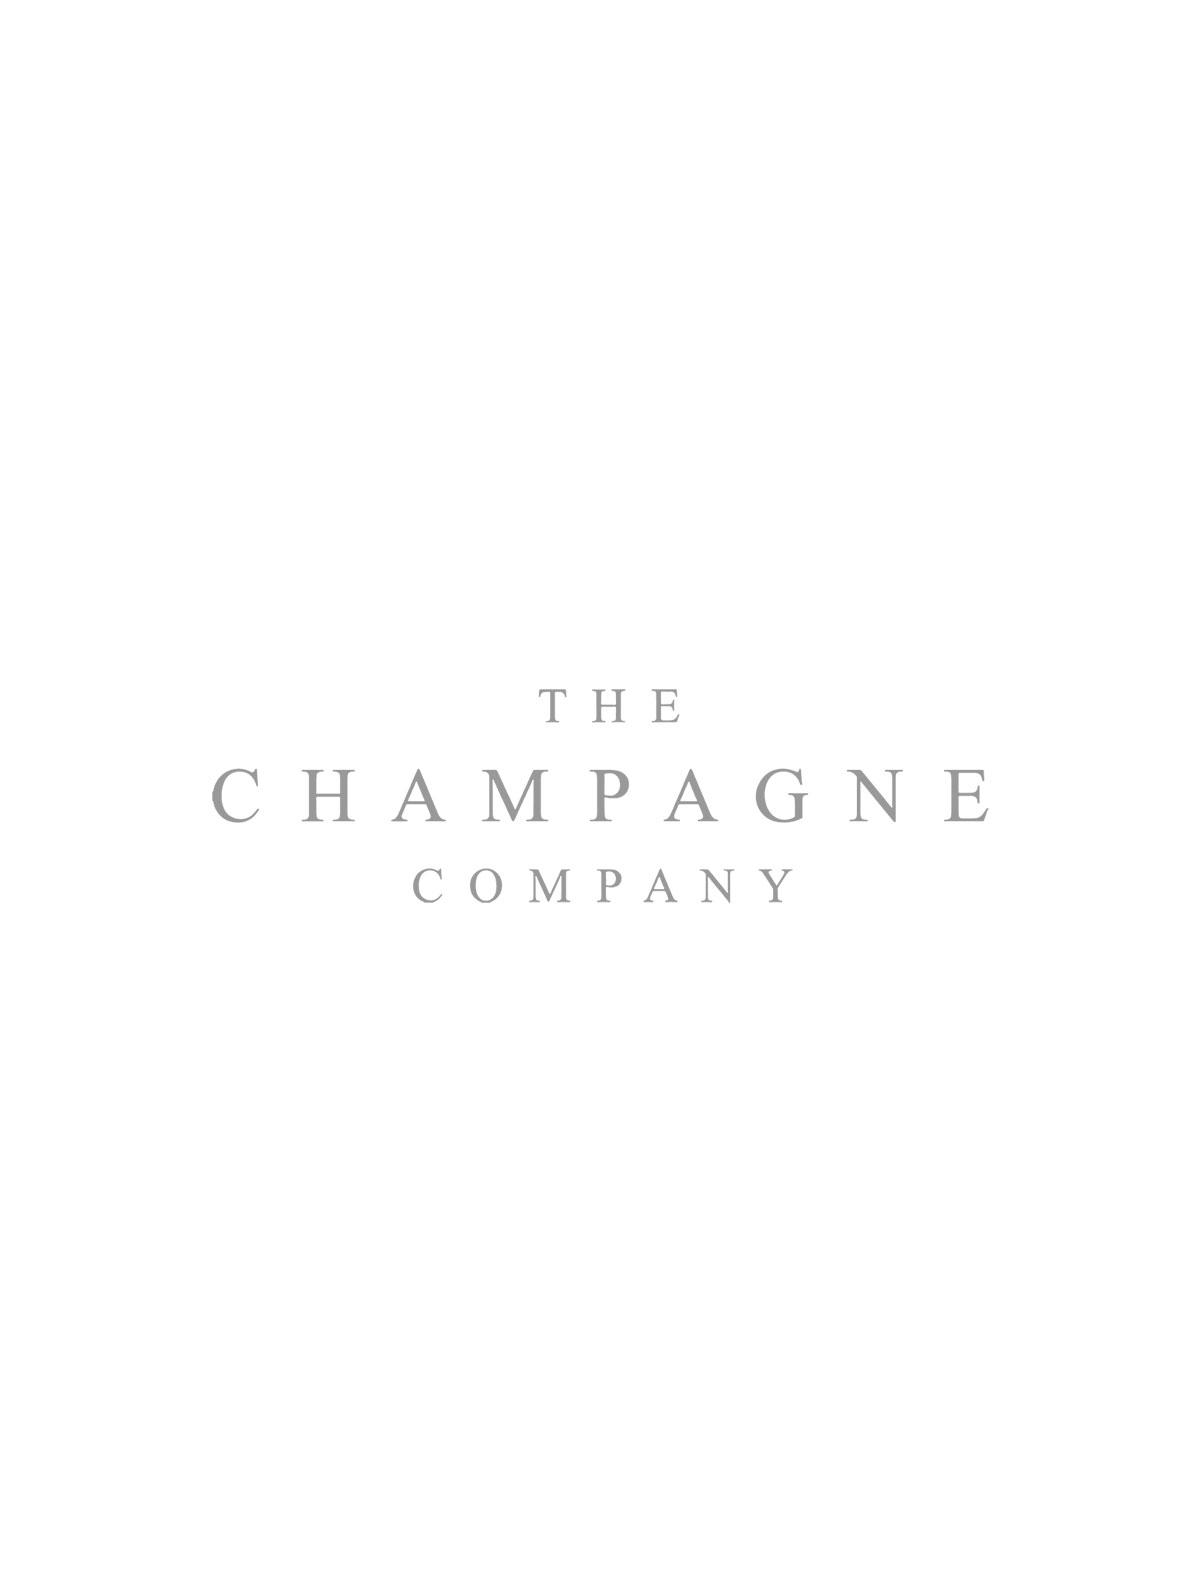 Penfolds Bin 28 Kalimna Shiraz 2016 Red Wine Australia 75cl